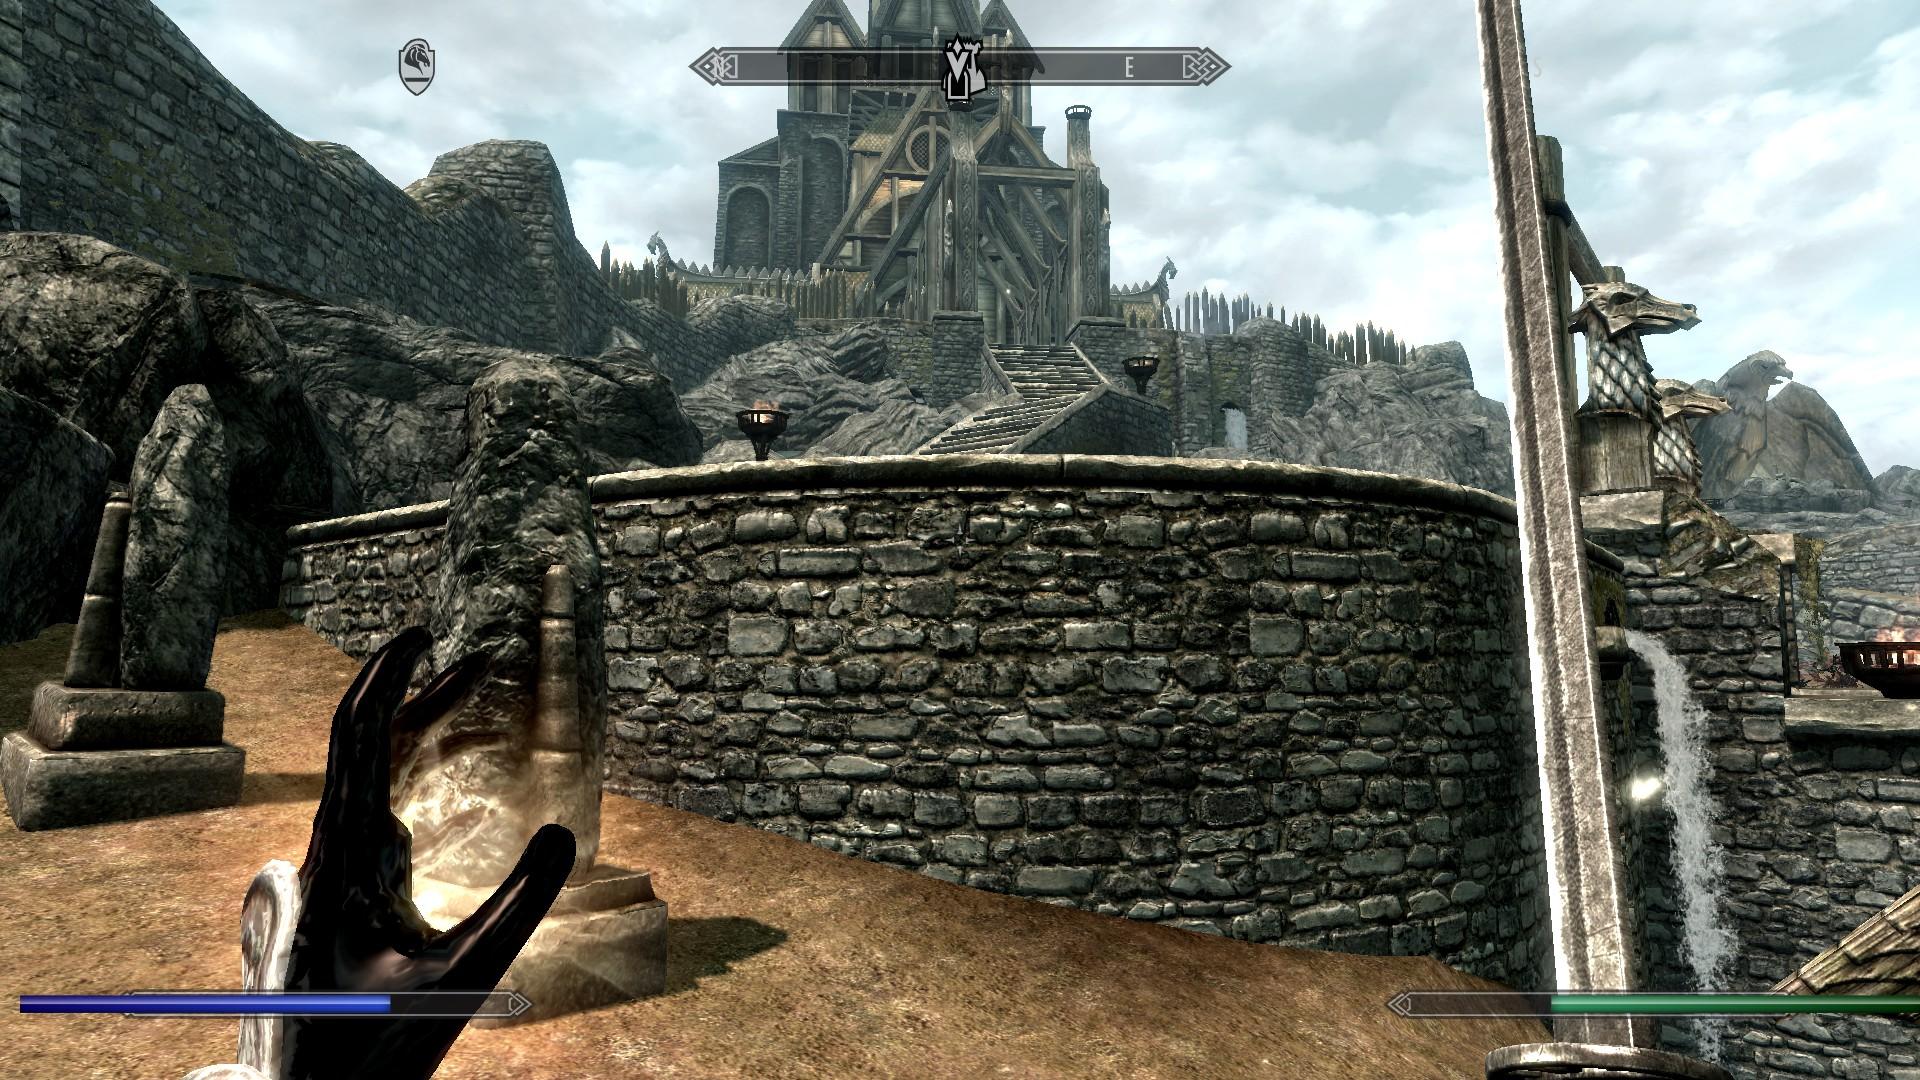 Skyrim Hud Probleme (PC, Spiele, Bug)